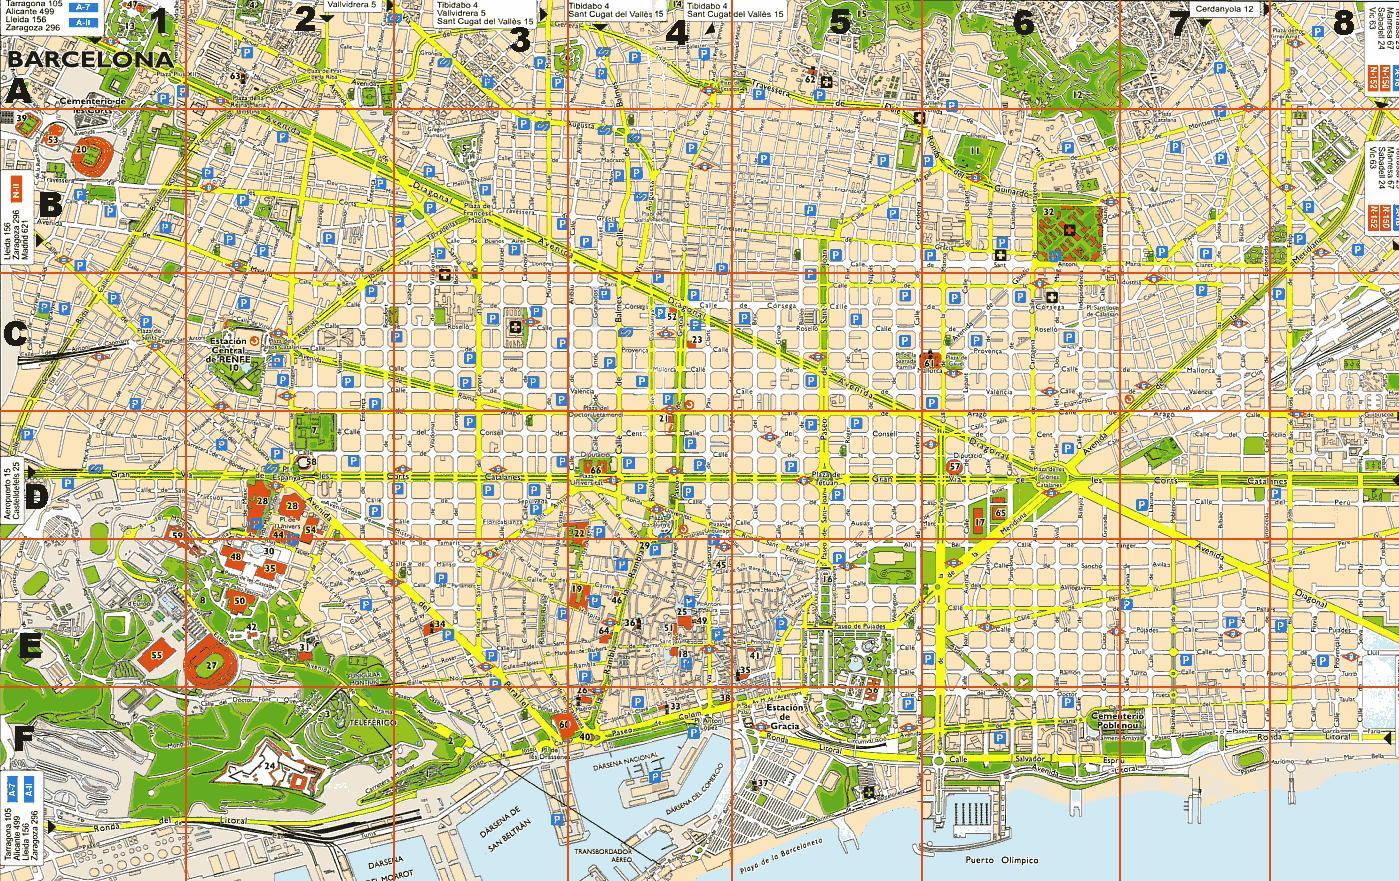 Detaljeret Kort Over Barcelona Gratis Kort Over Barcelona